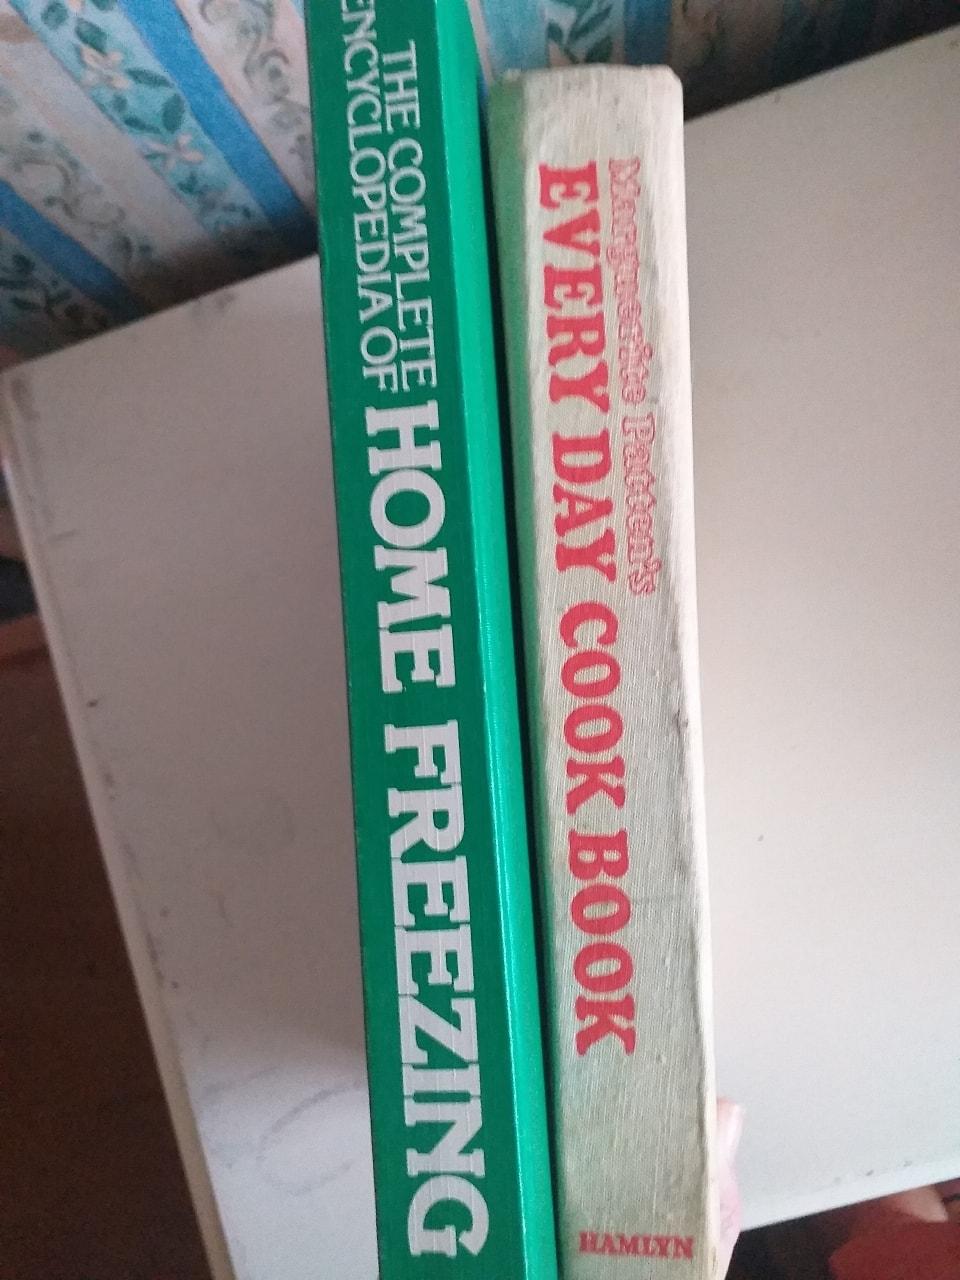 2 old cookbook